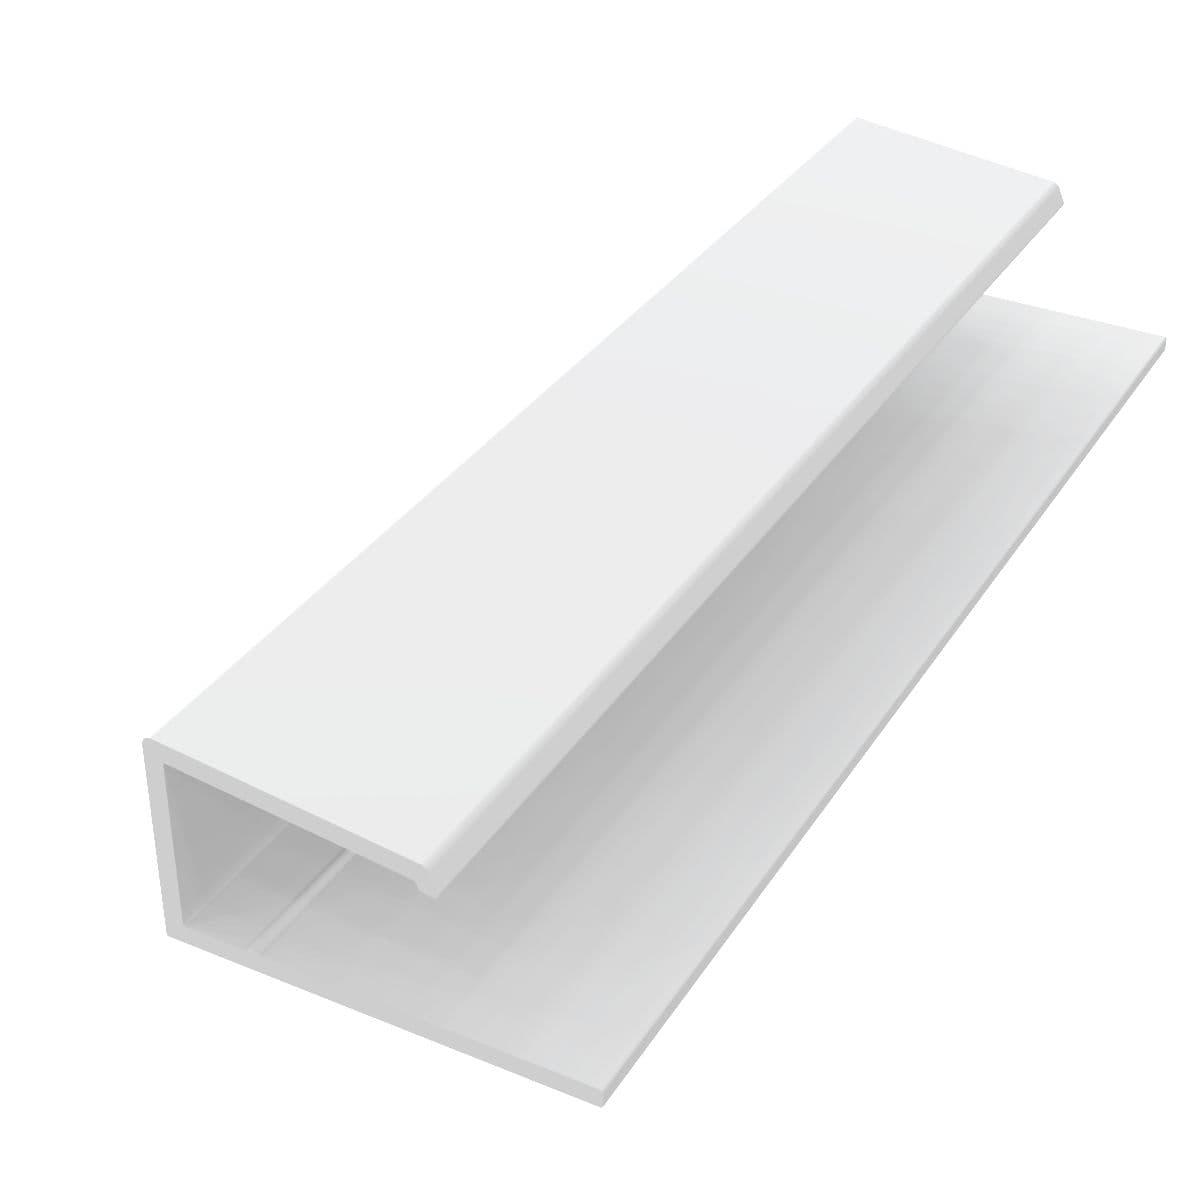 Freefoam Plastics - Bordure En U Pro - Pvc Blanc - L. 3 M ... pour Bordure Aluminium Point P